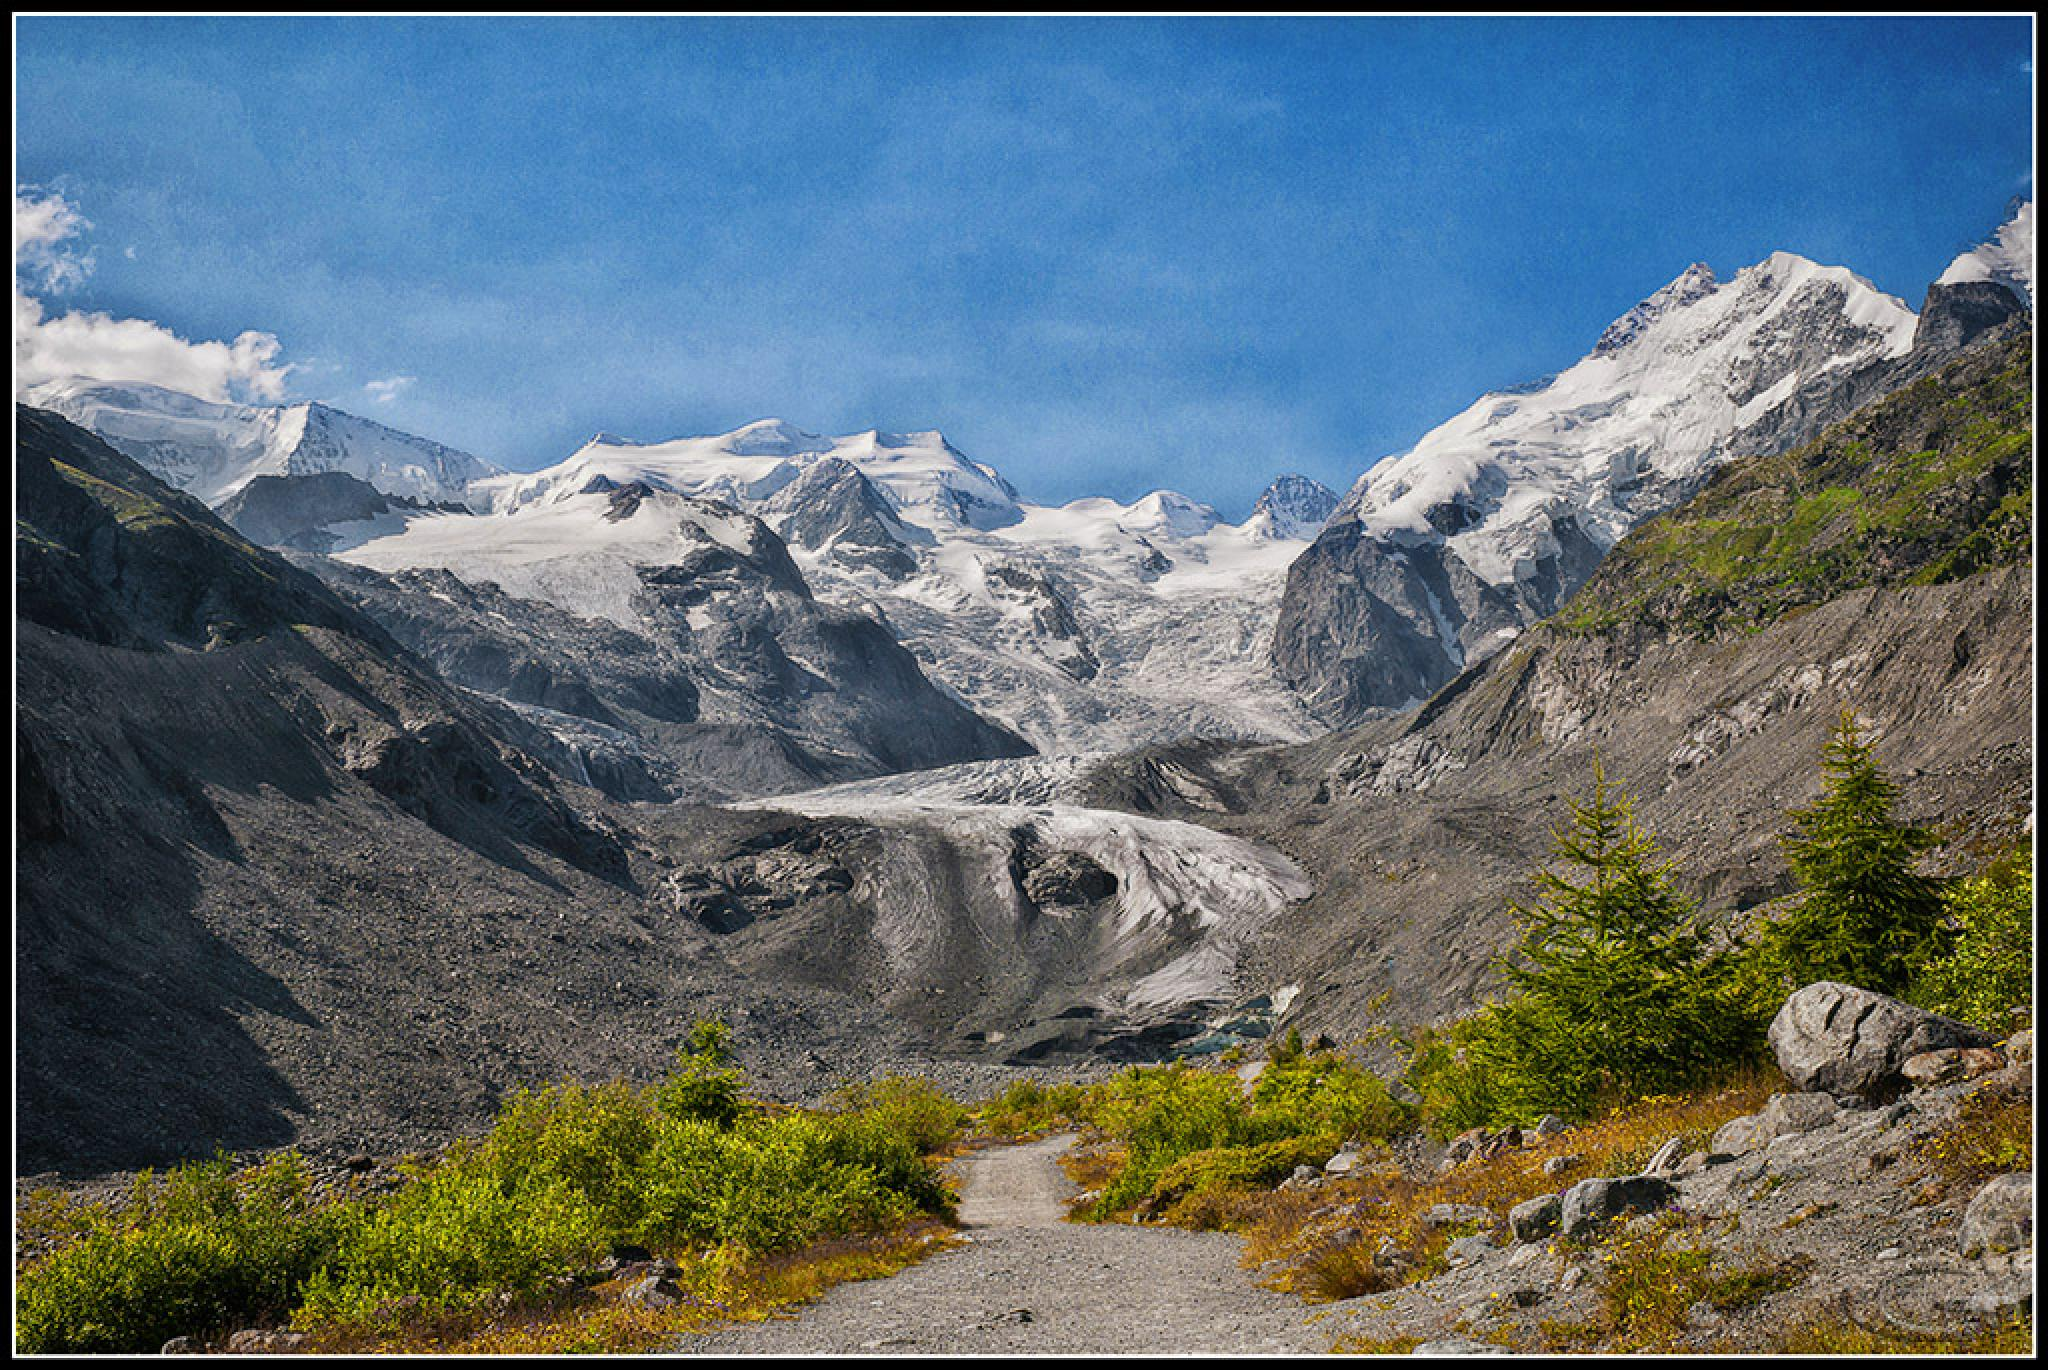 Morteratsch Glacier by Giuseppe Mantenuto